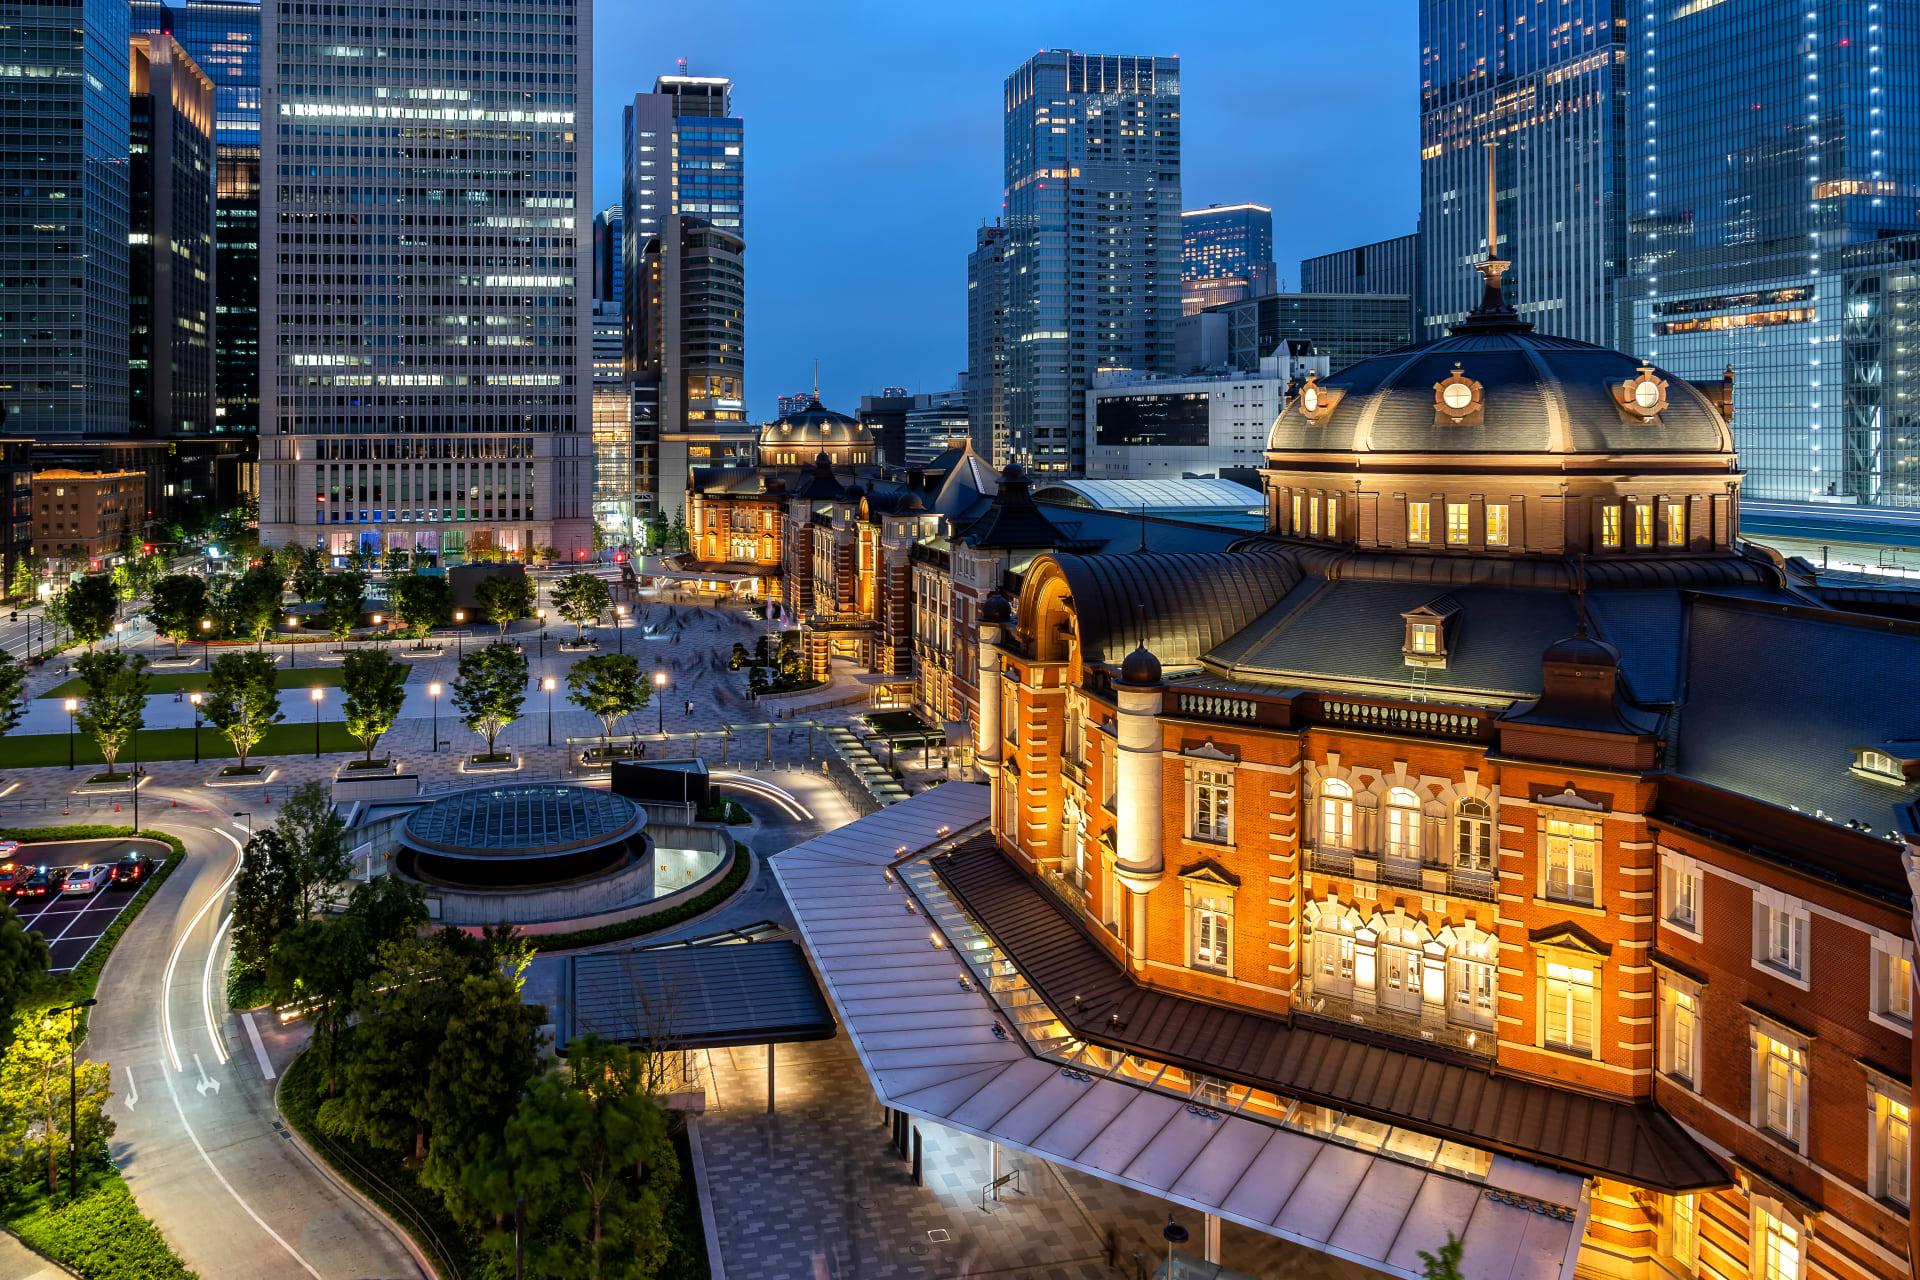 Tokyo - Tokyo Walk 1: Remarkable Tokyo Station